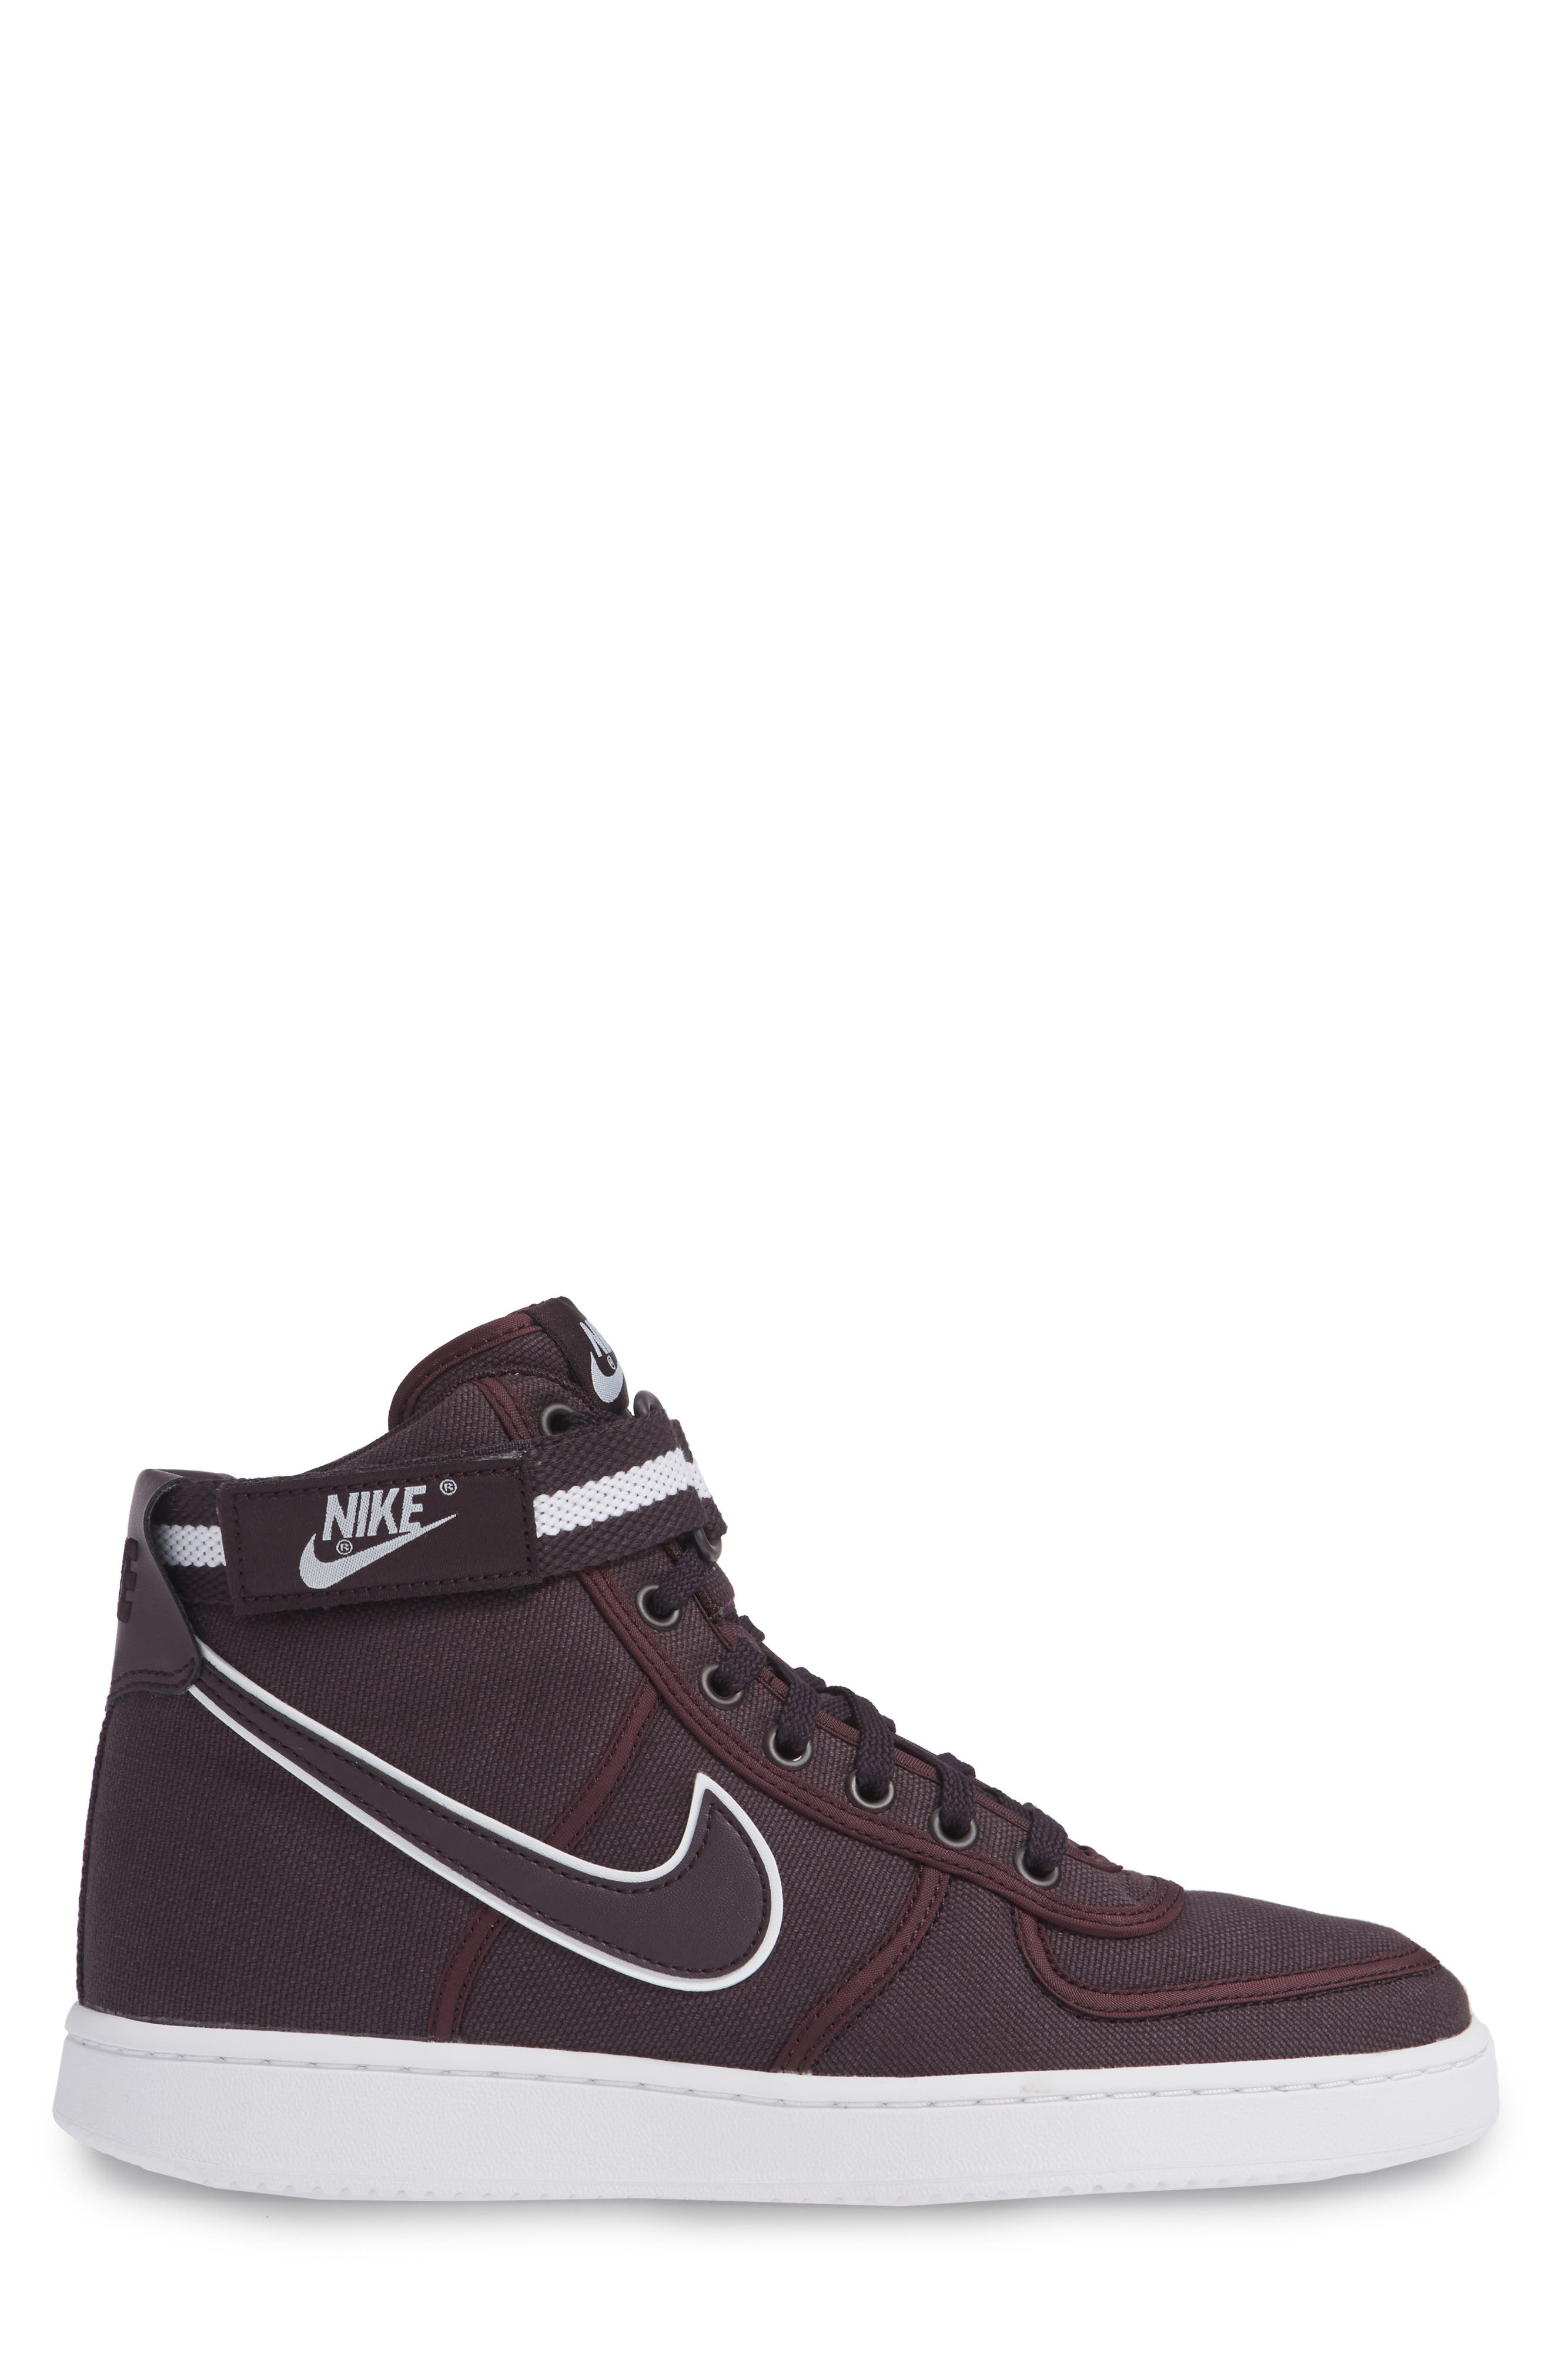 Vandal High Supreme High Top Sneaker,                             Alternate thumbnail 6, color,                             Burgundy Ash/ White